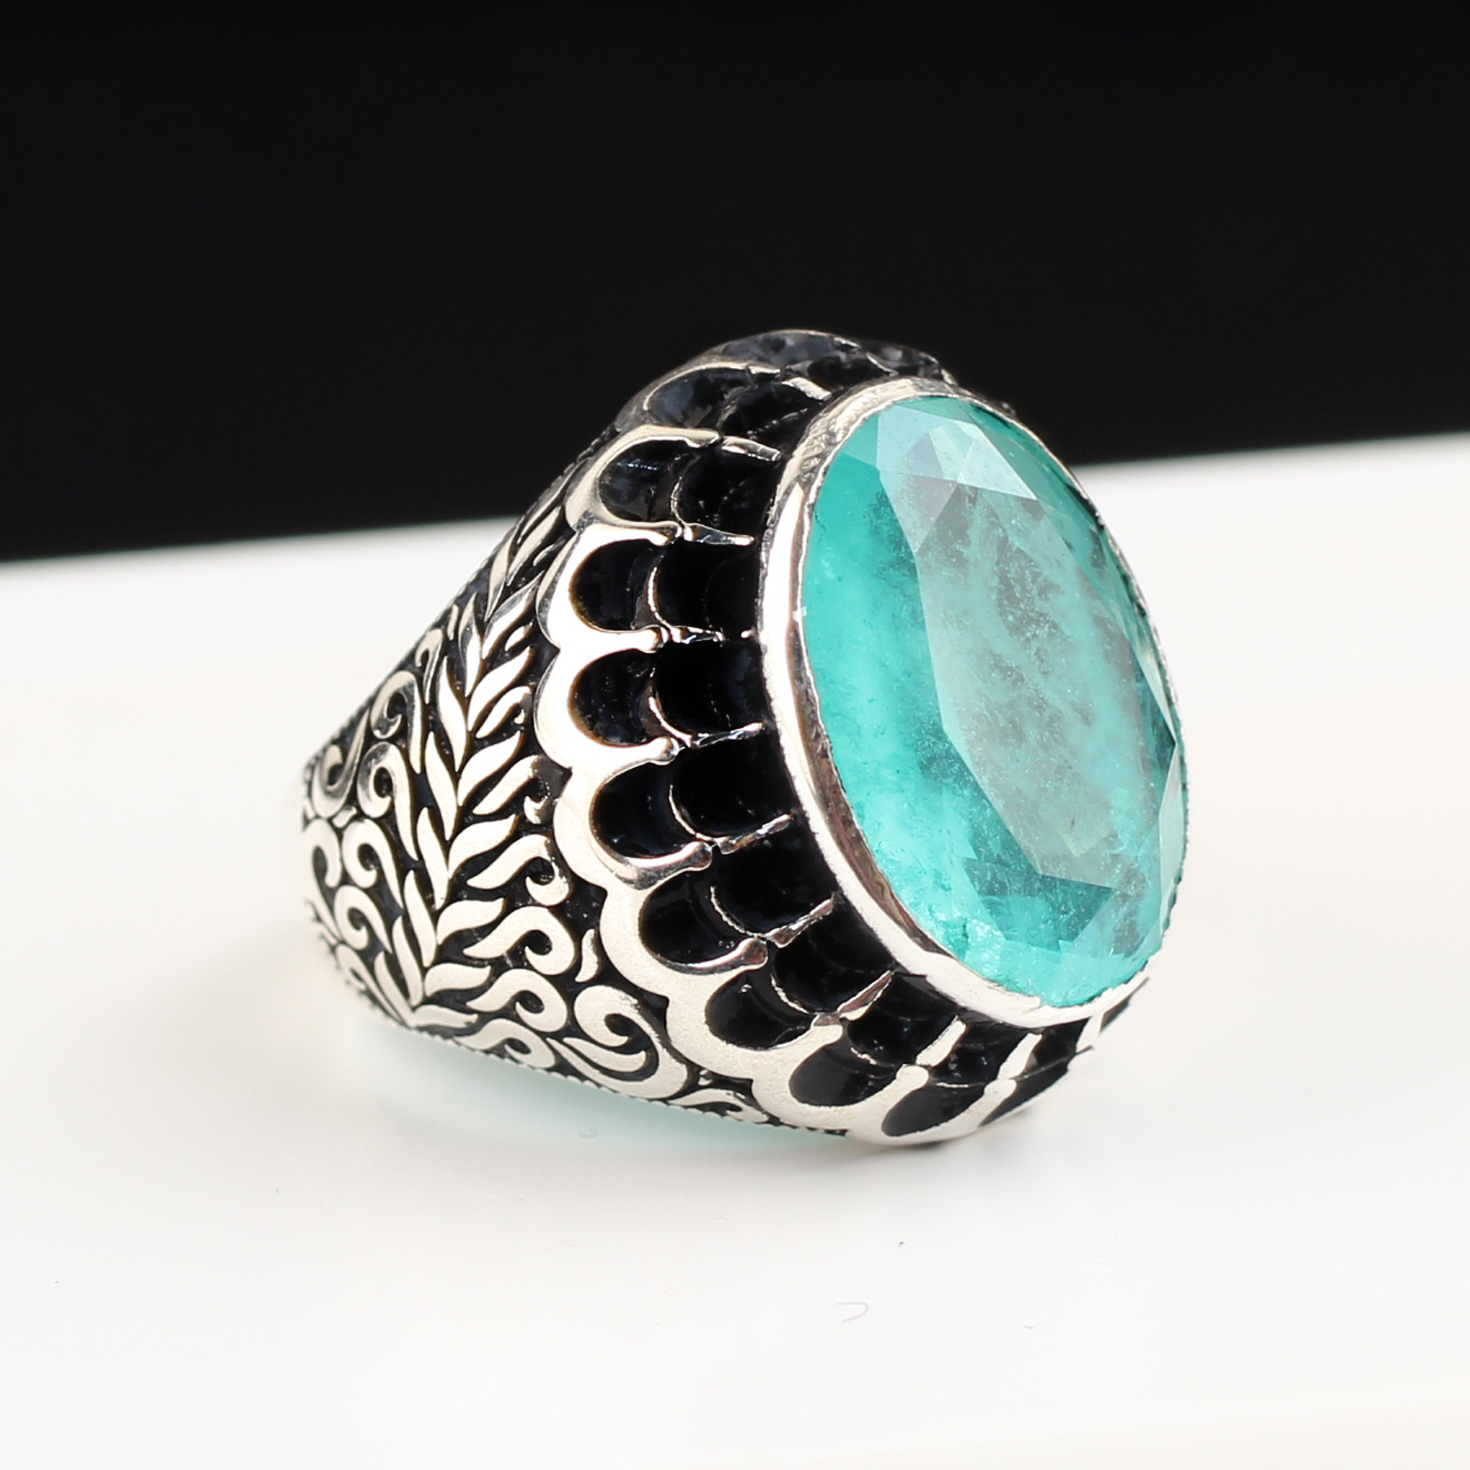 Blue Paraiba Tourmaline Ring, Mens 925 Silver Handmade Ring, Handmade Man Intricate Sterling Silver Paraiba Ring